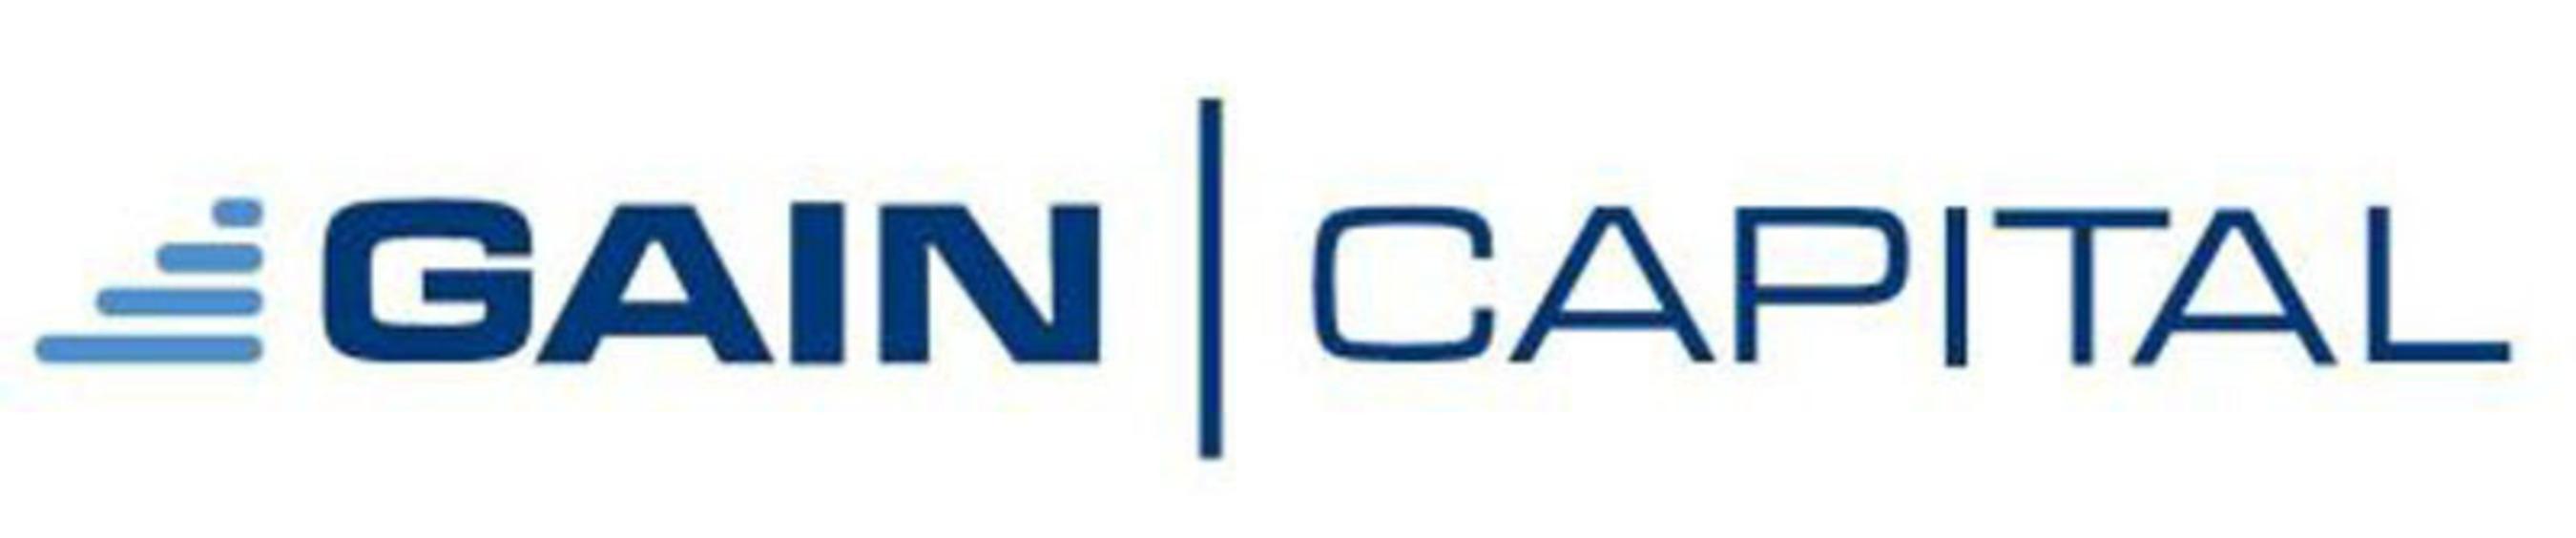 GAIN Capital Holdings, Inc. Logo.